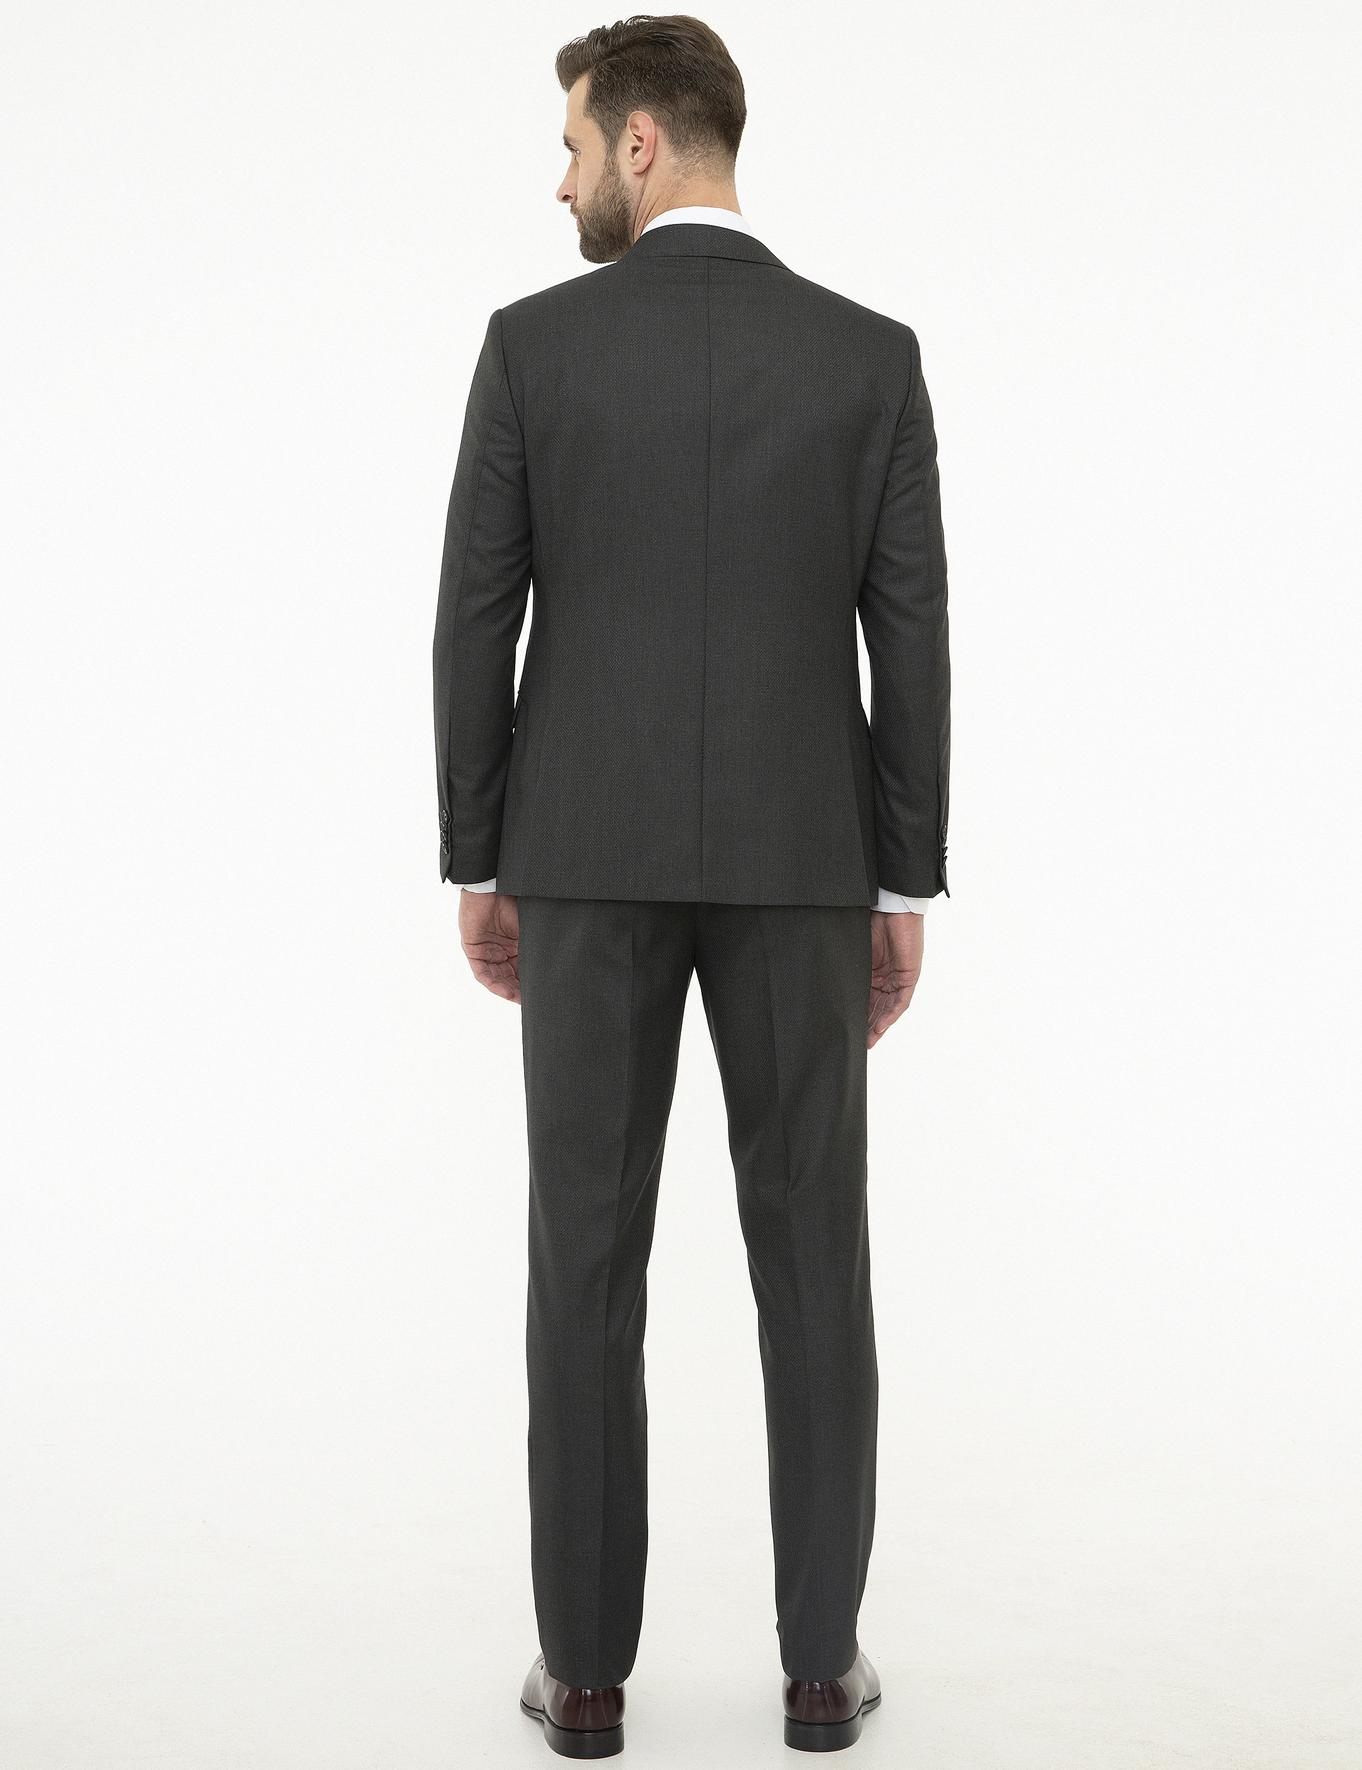 Antrasit Slim Fit Takım Elbise